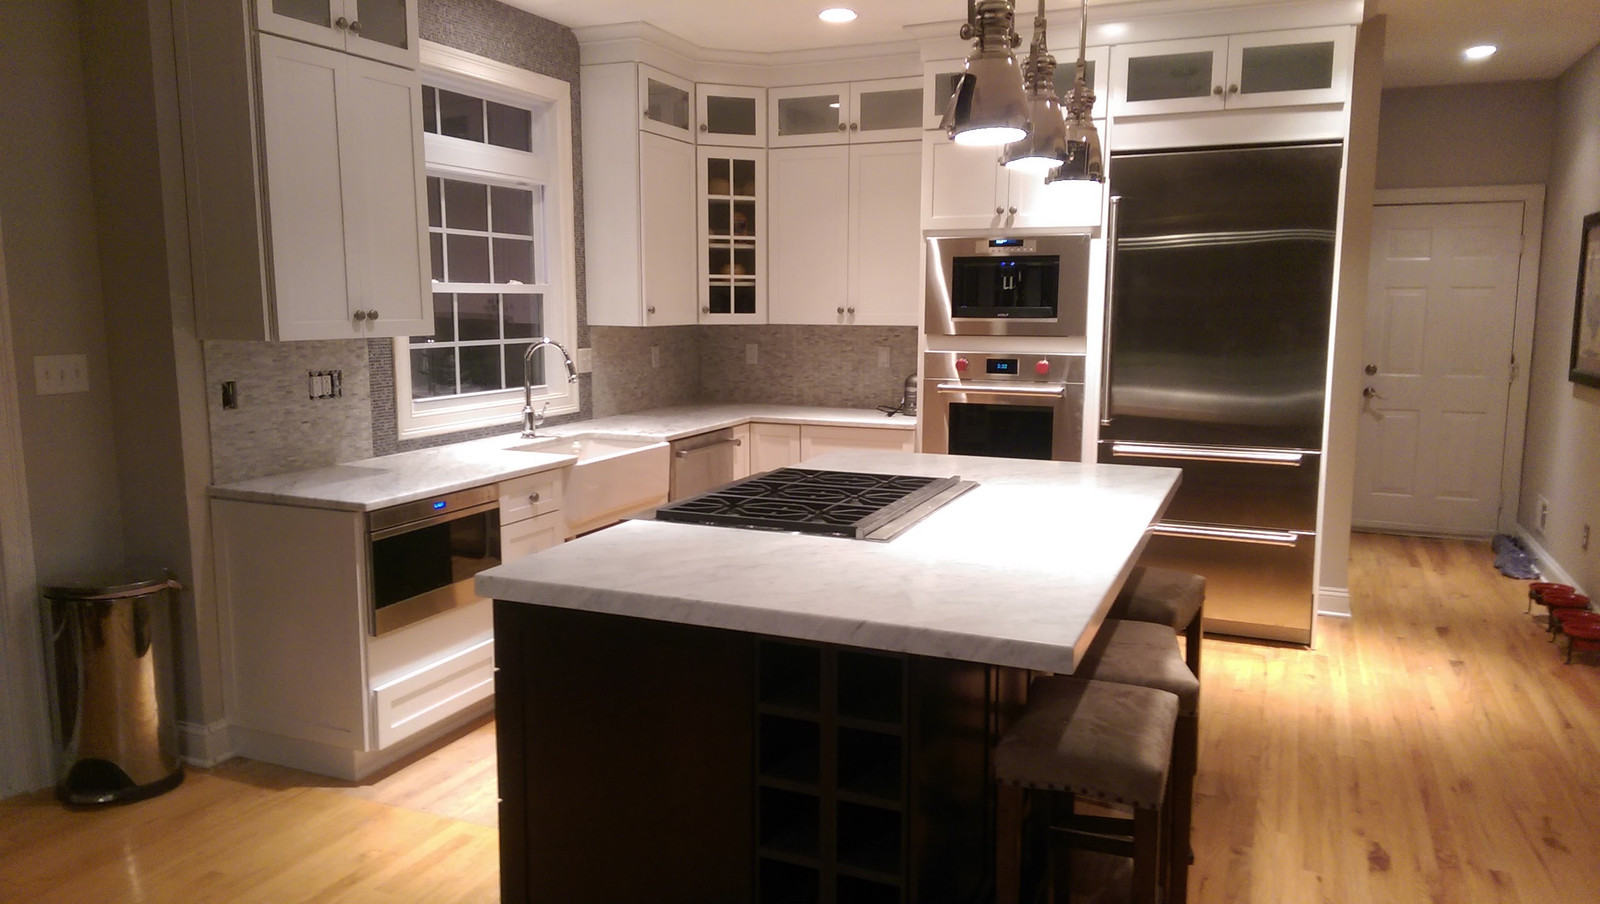 glastonbury, ct kitchen with island